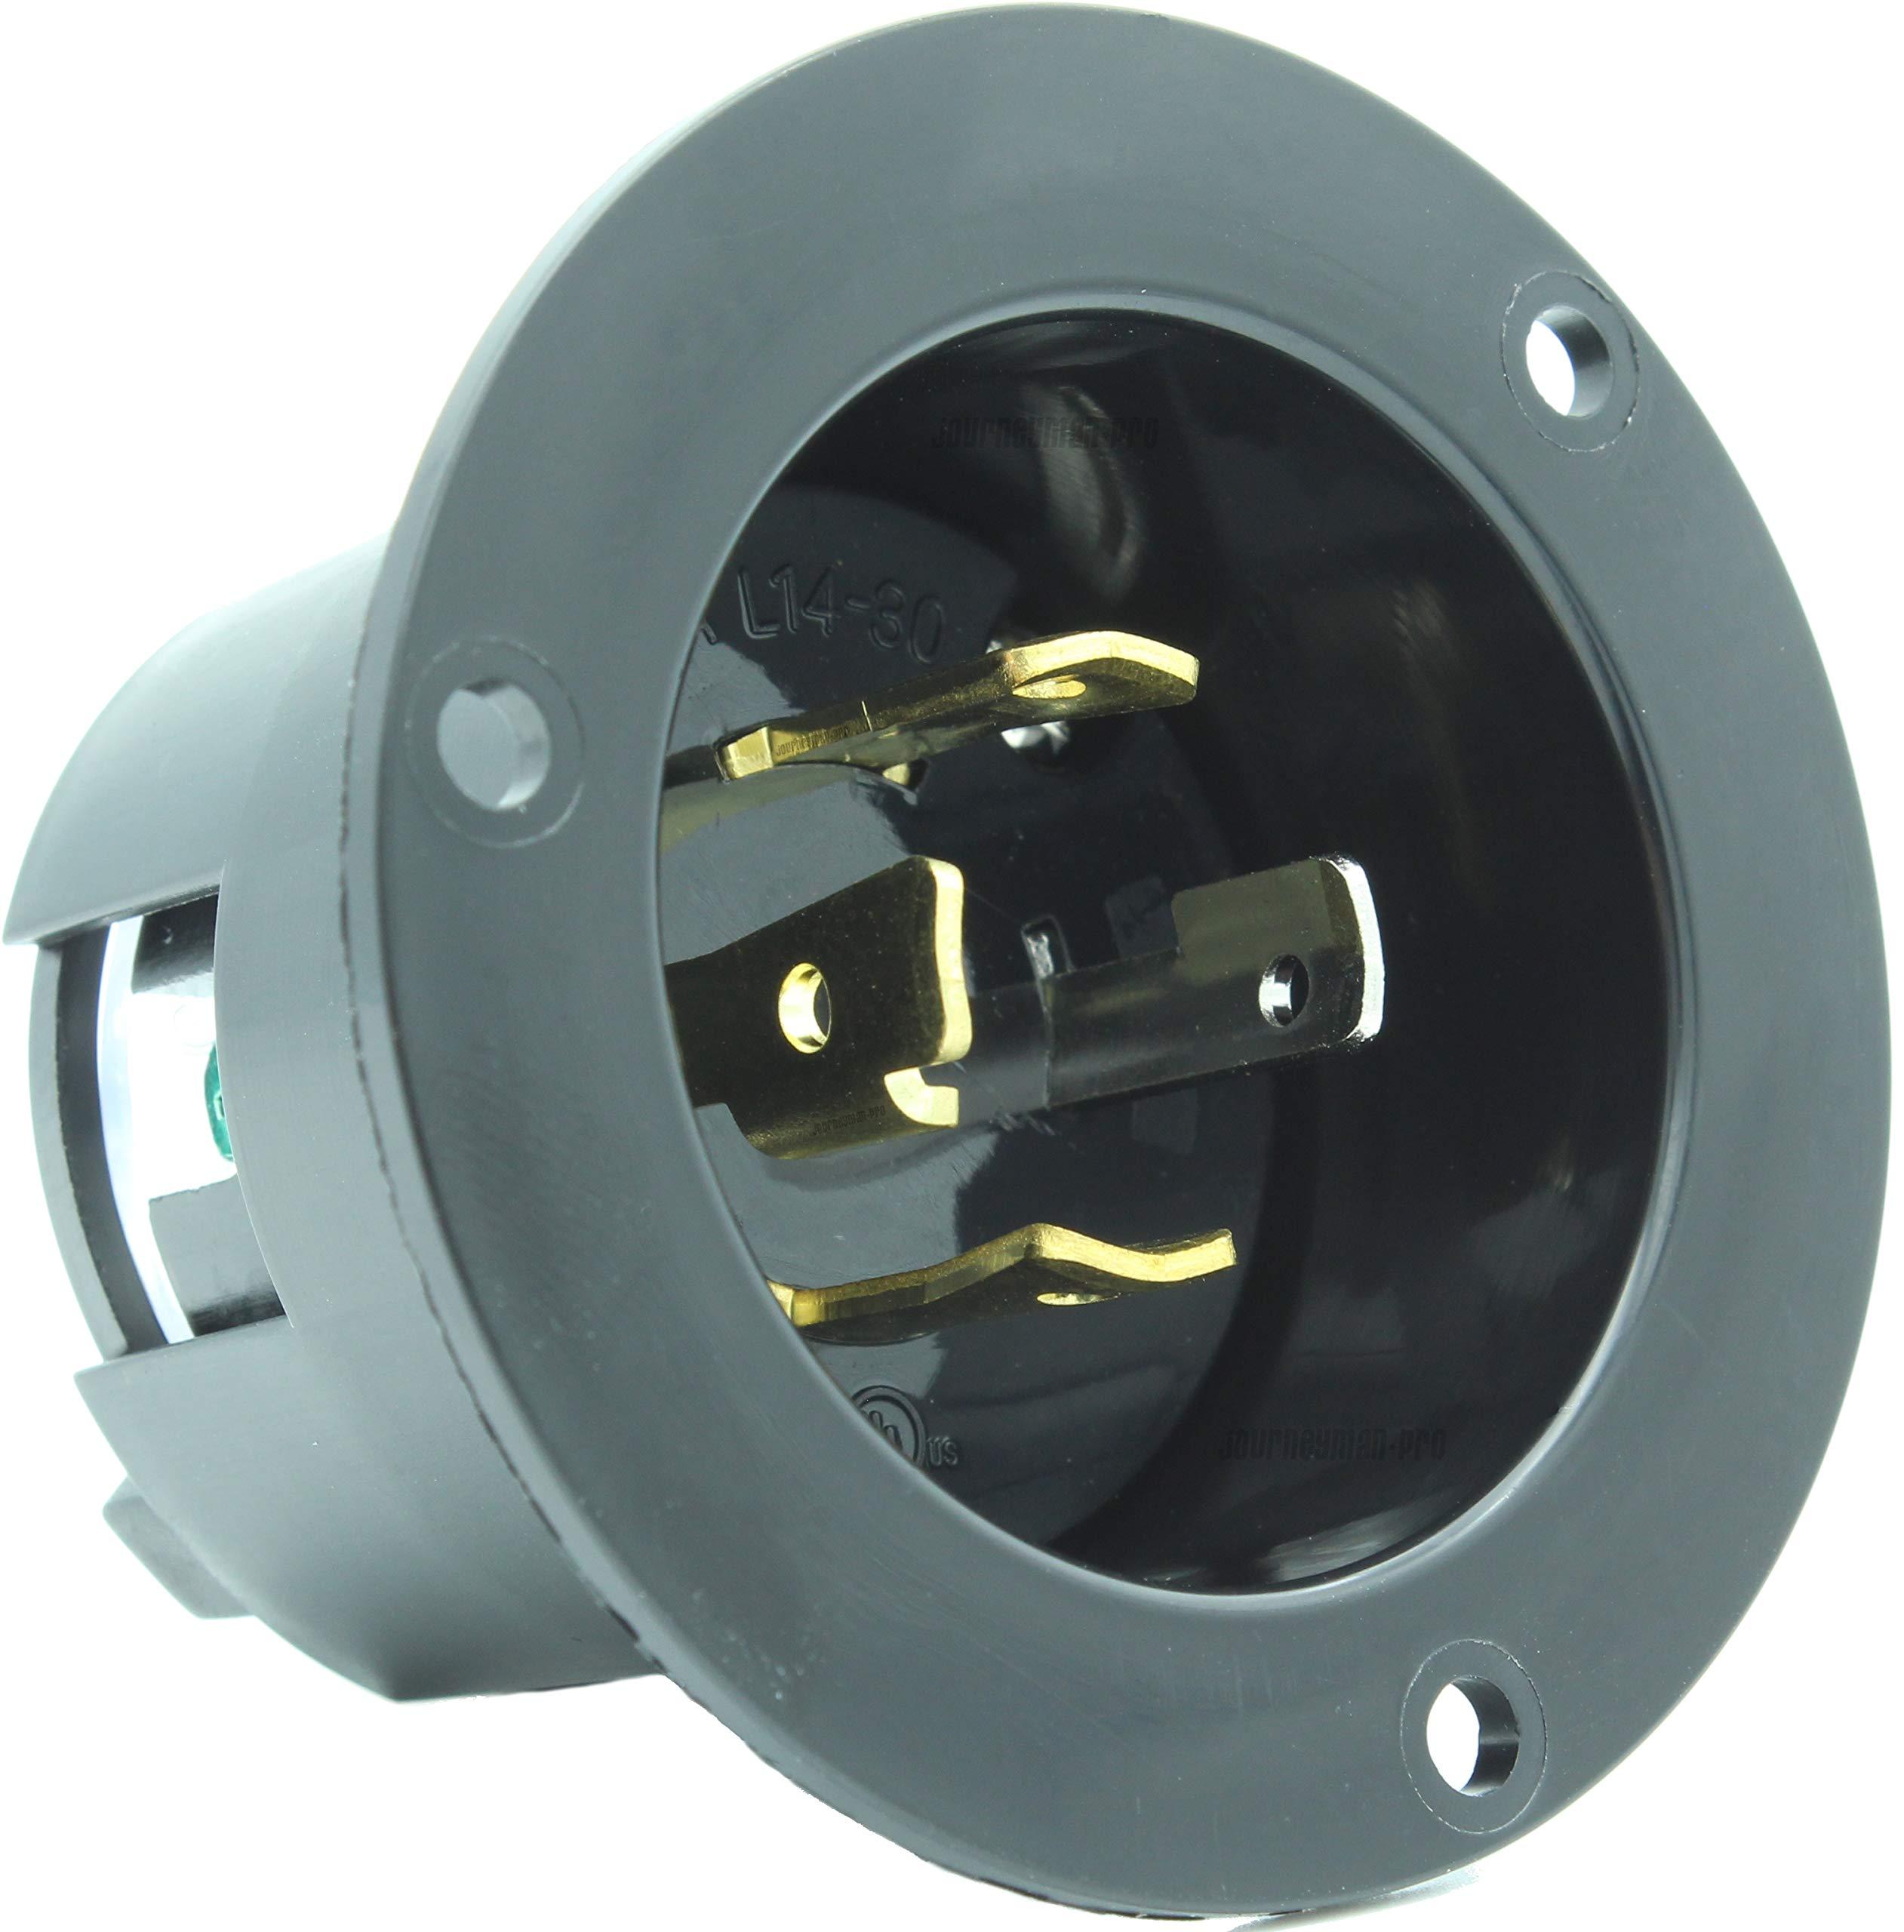 journeyman-pro 2715, nema l14-30 flanged inlet generator plug, 30a 125/250  volt, locking receptacle socket, black industrial grade, grounding welding  use